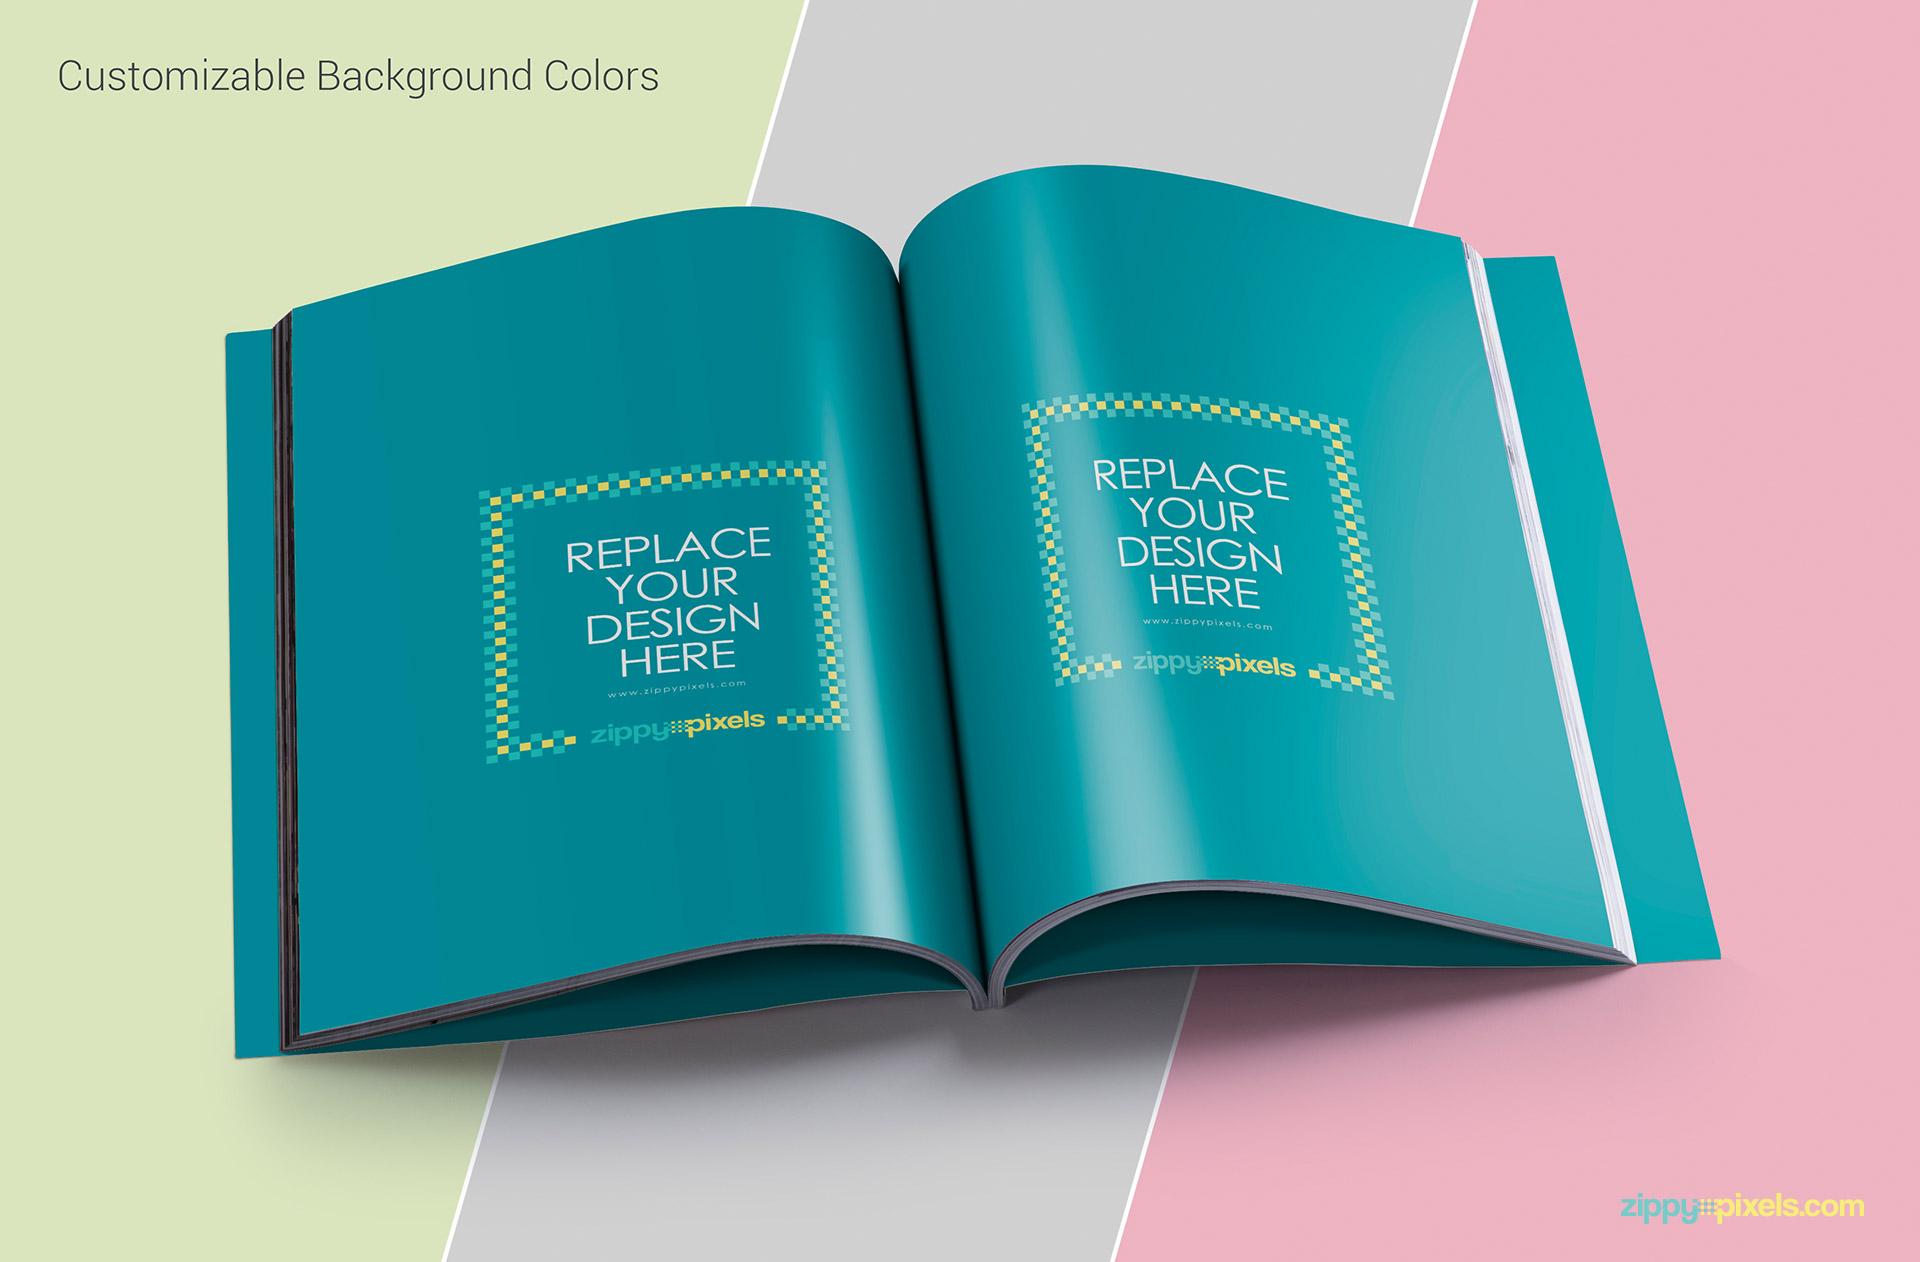 Layered PSD Mockup of Magazine designs - Customizable background